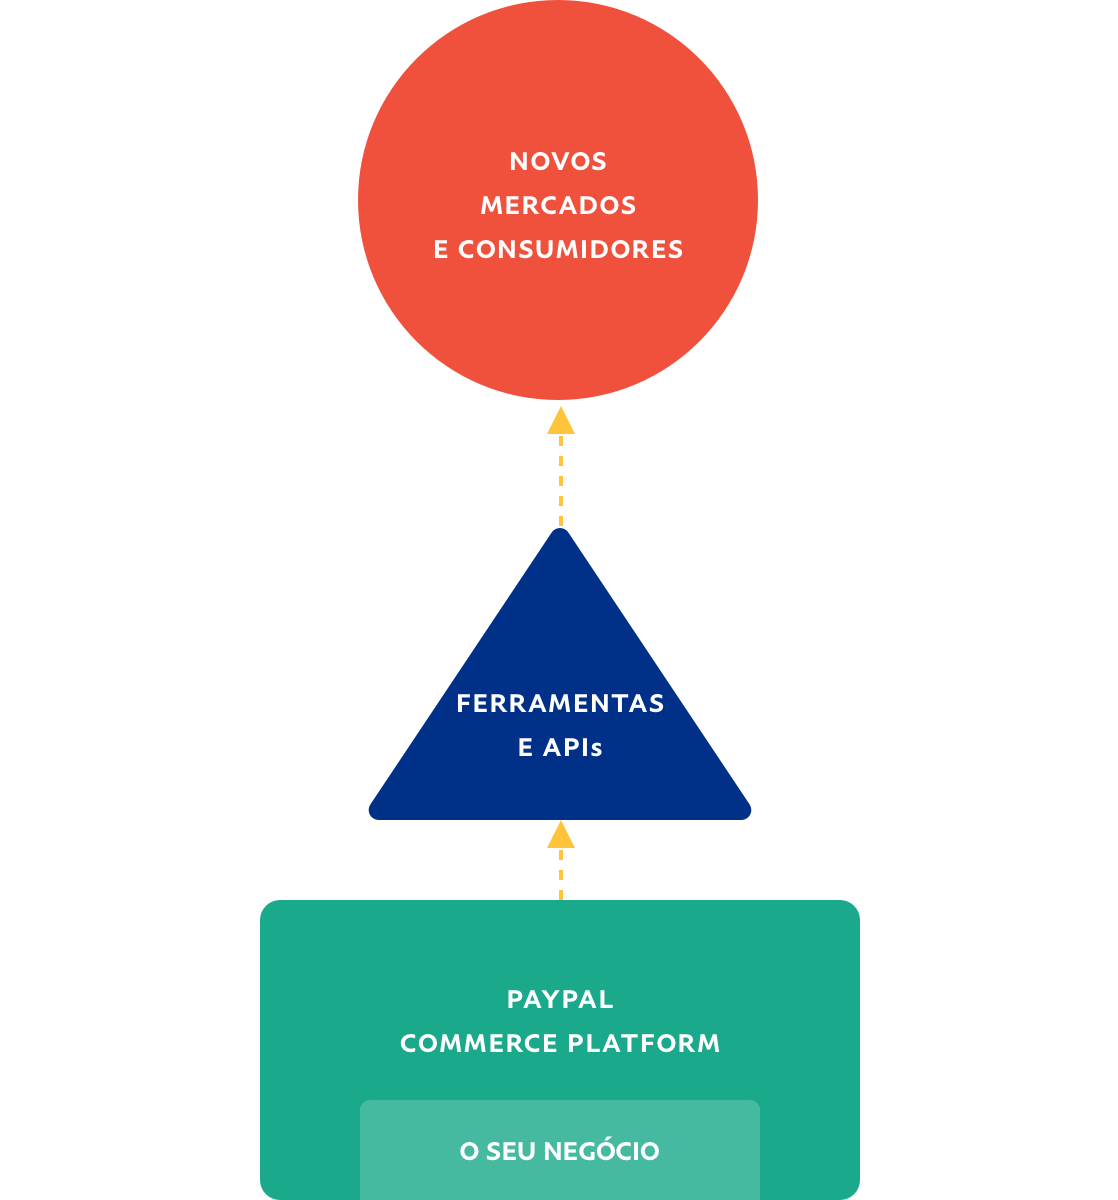 Fluxograma representando um fluxo de negócio para novos mercados e consumidores.